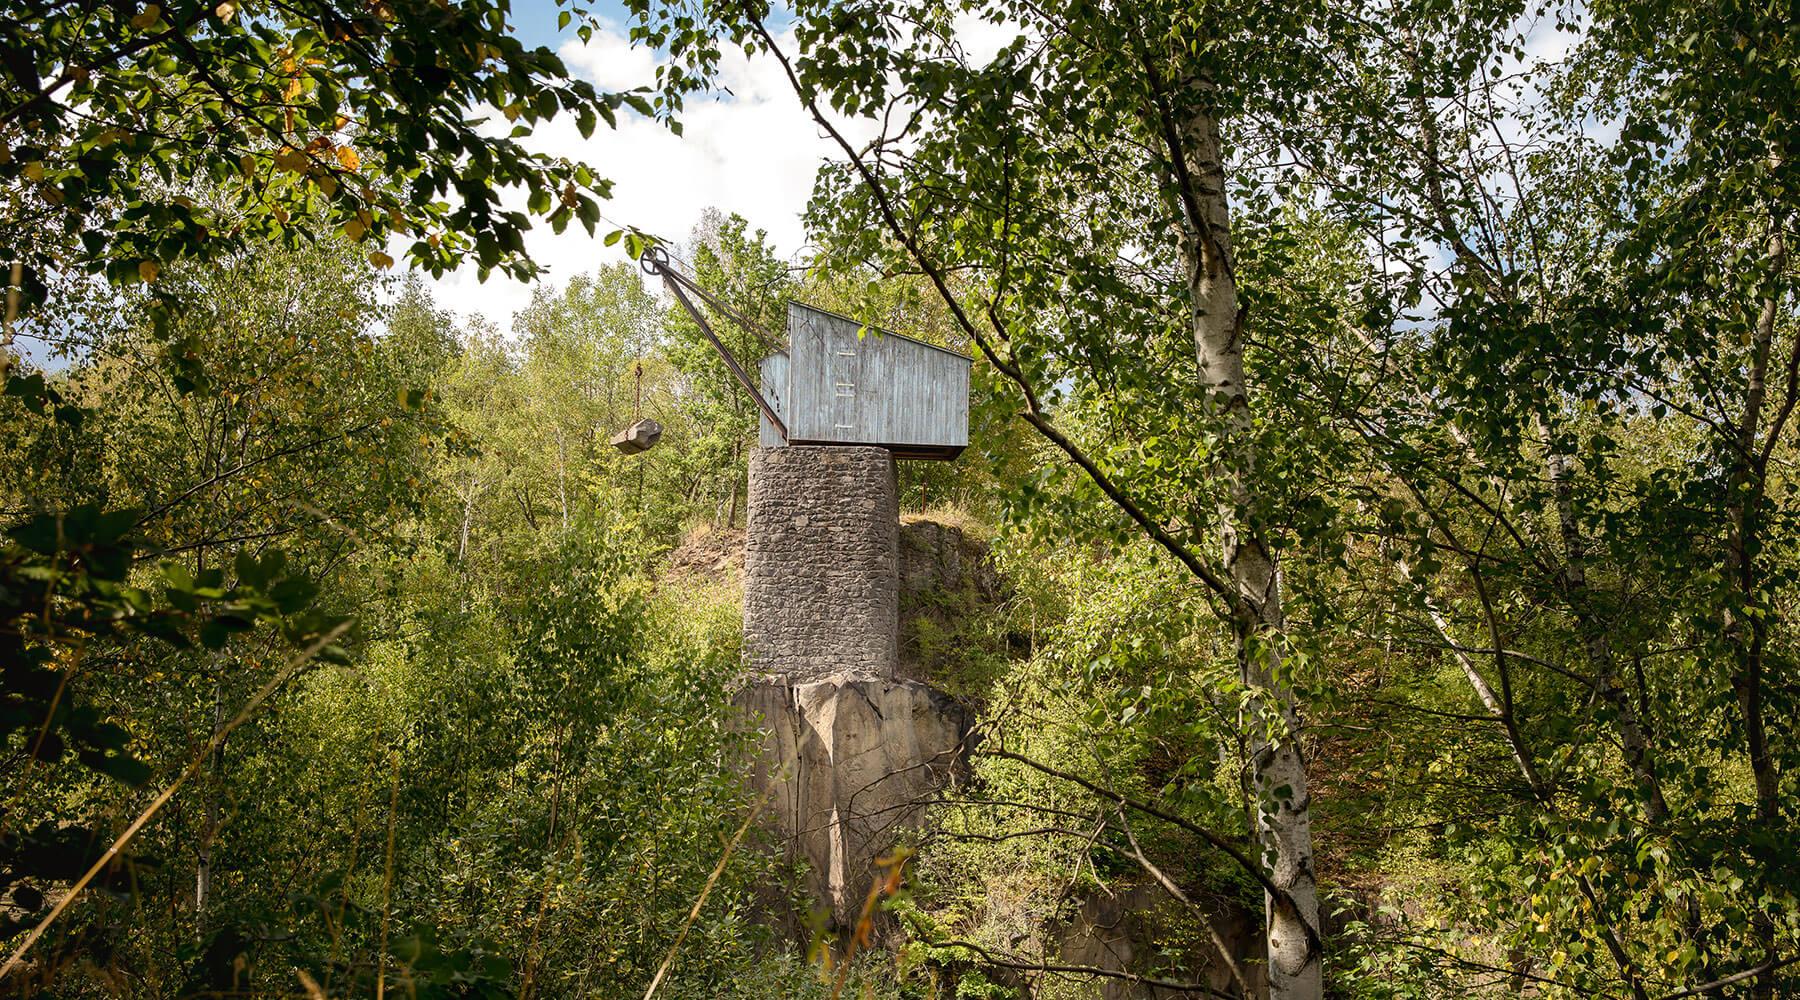 Vulkanpark, Mayener Grubenfeld. Ein Kran im Grubenfeld.